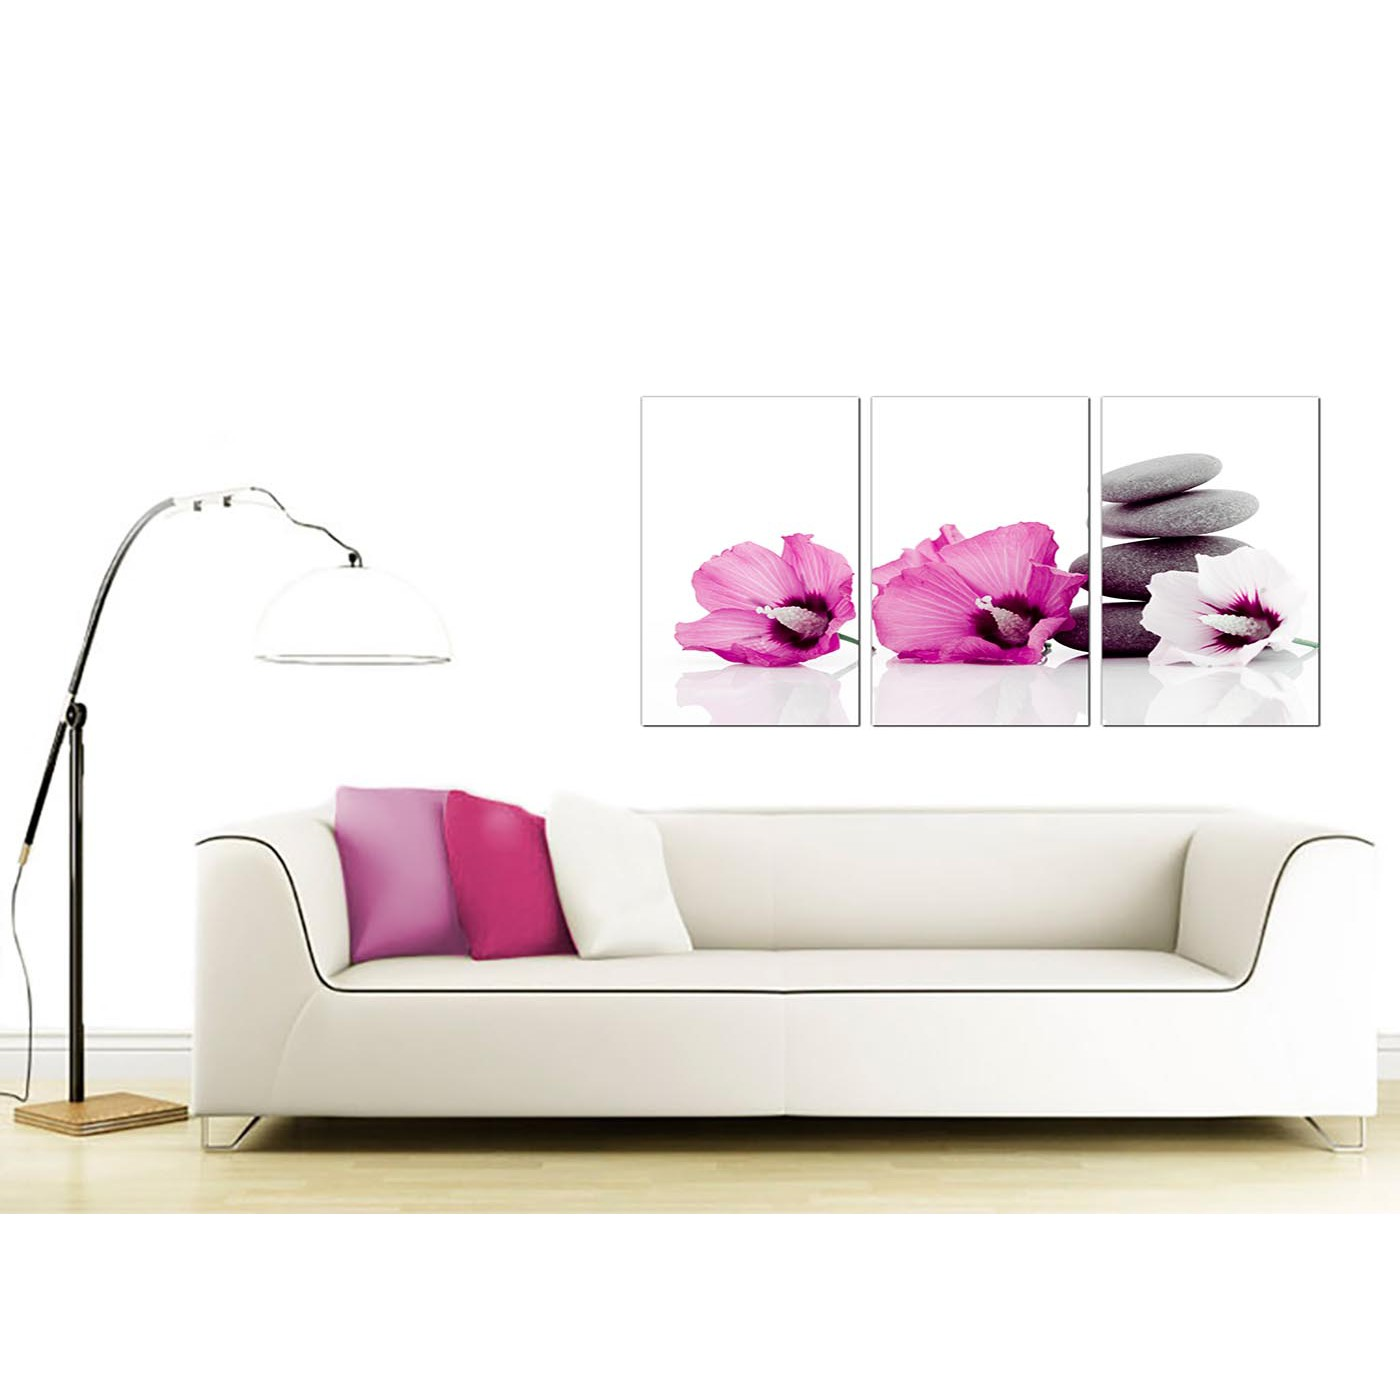 Bedroom Canvas Wall Art Uk: Flowers Canvas Prints UK Set Of 3 For Your Girls Bedroom